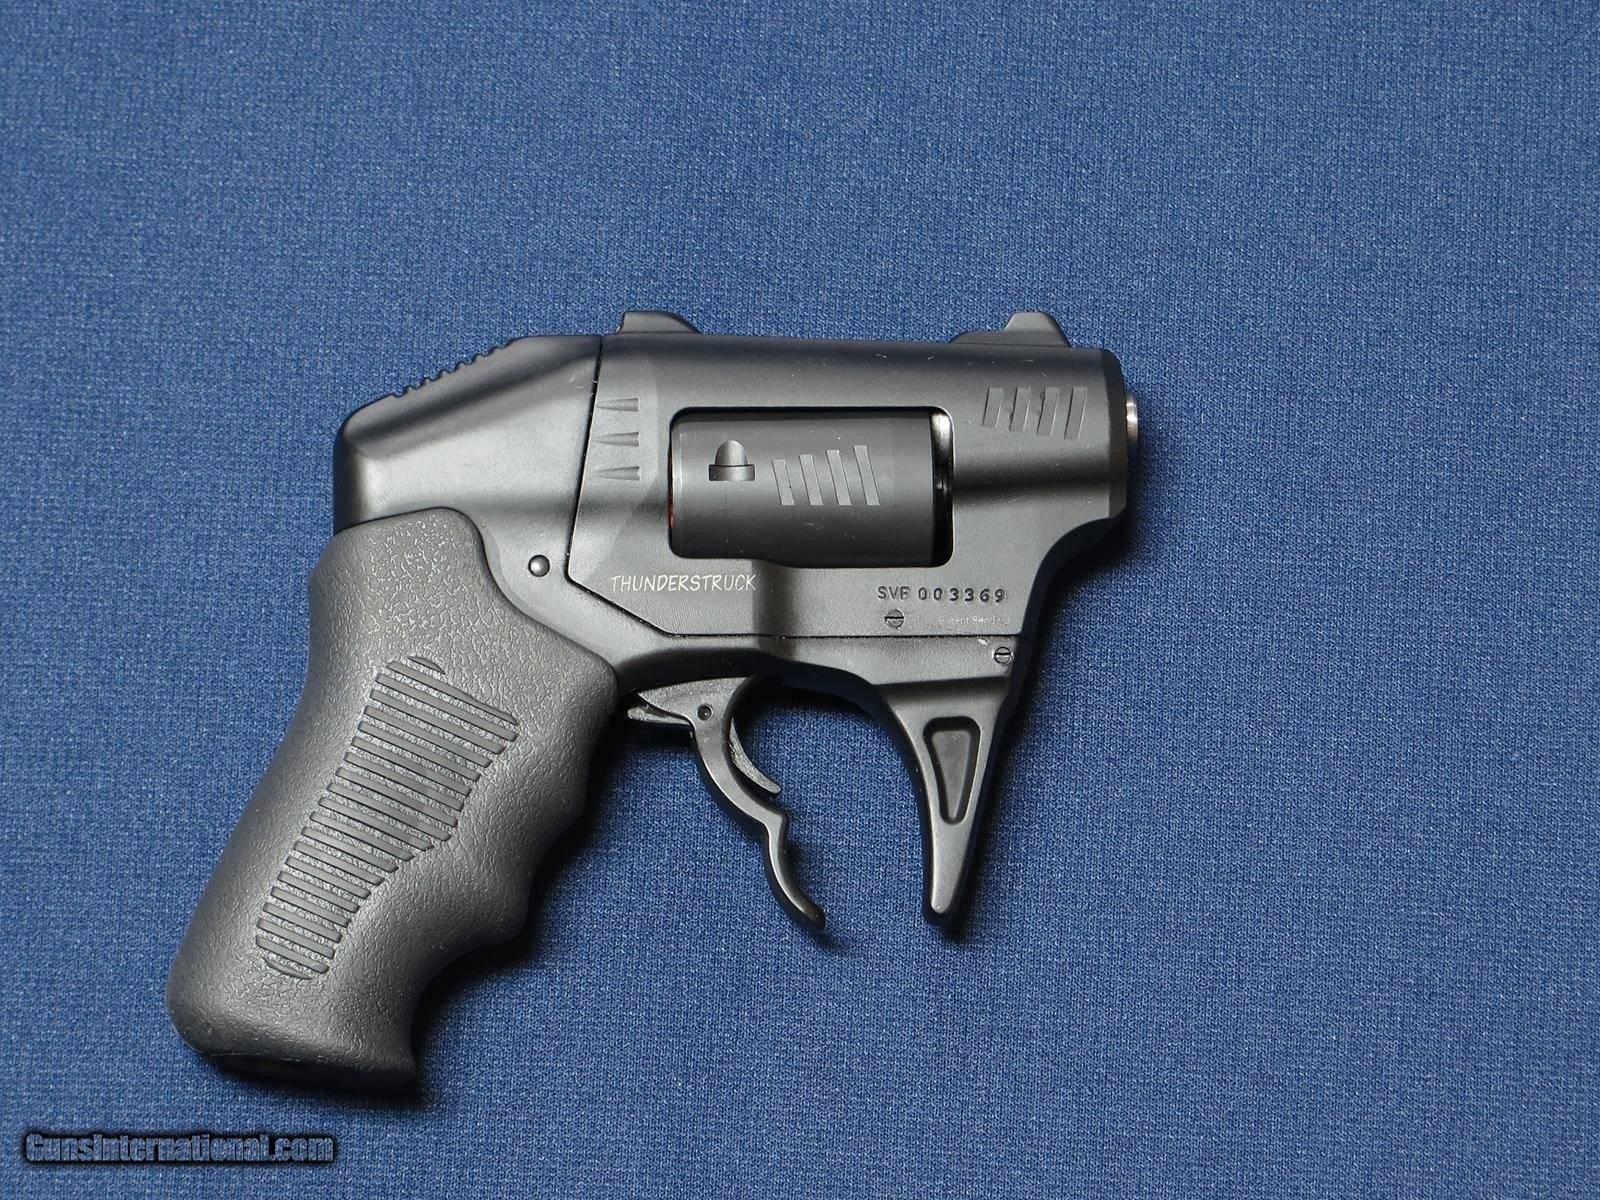 Зрк «стрела-10»: модификации, фото, характеристики, видео